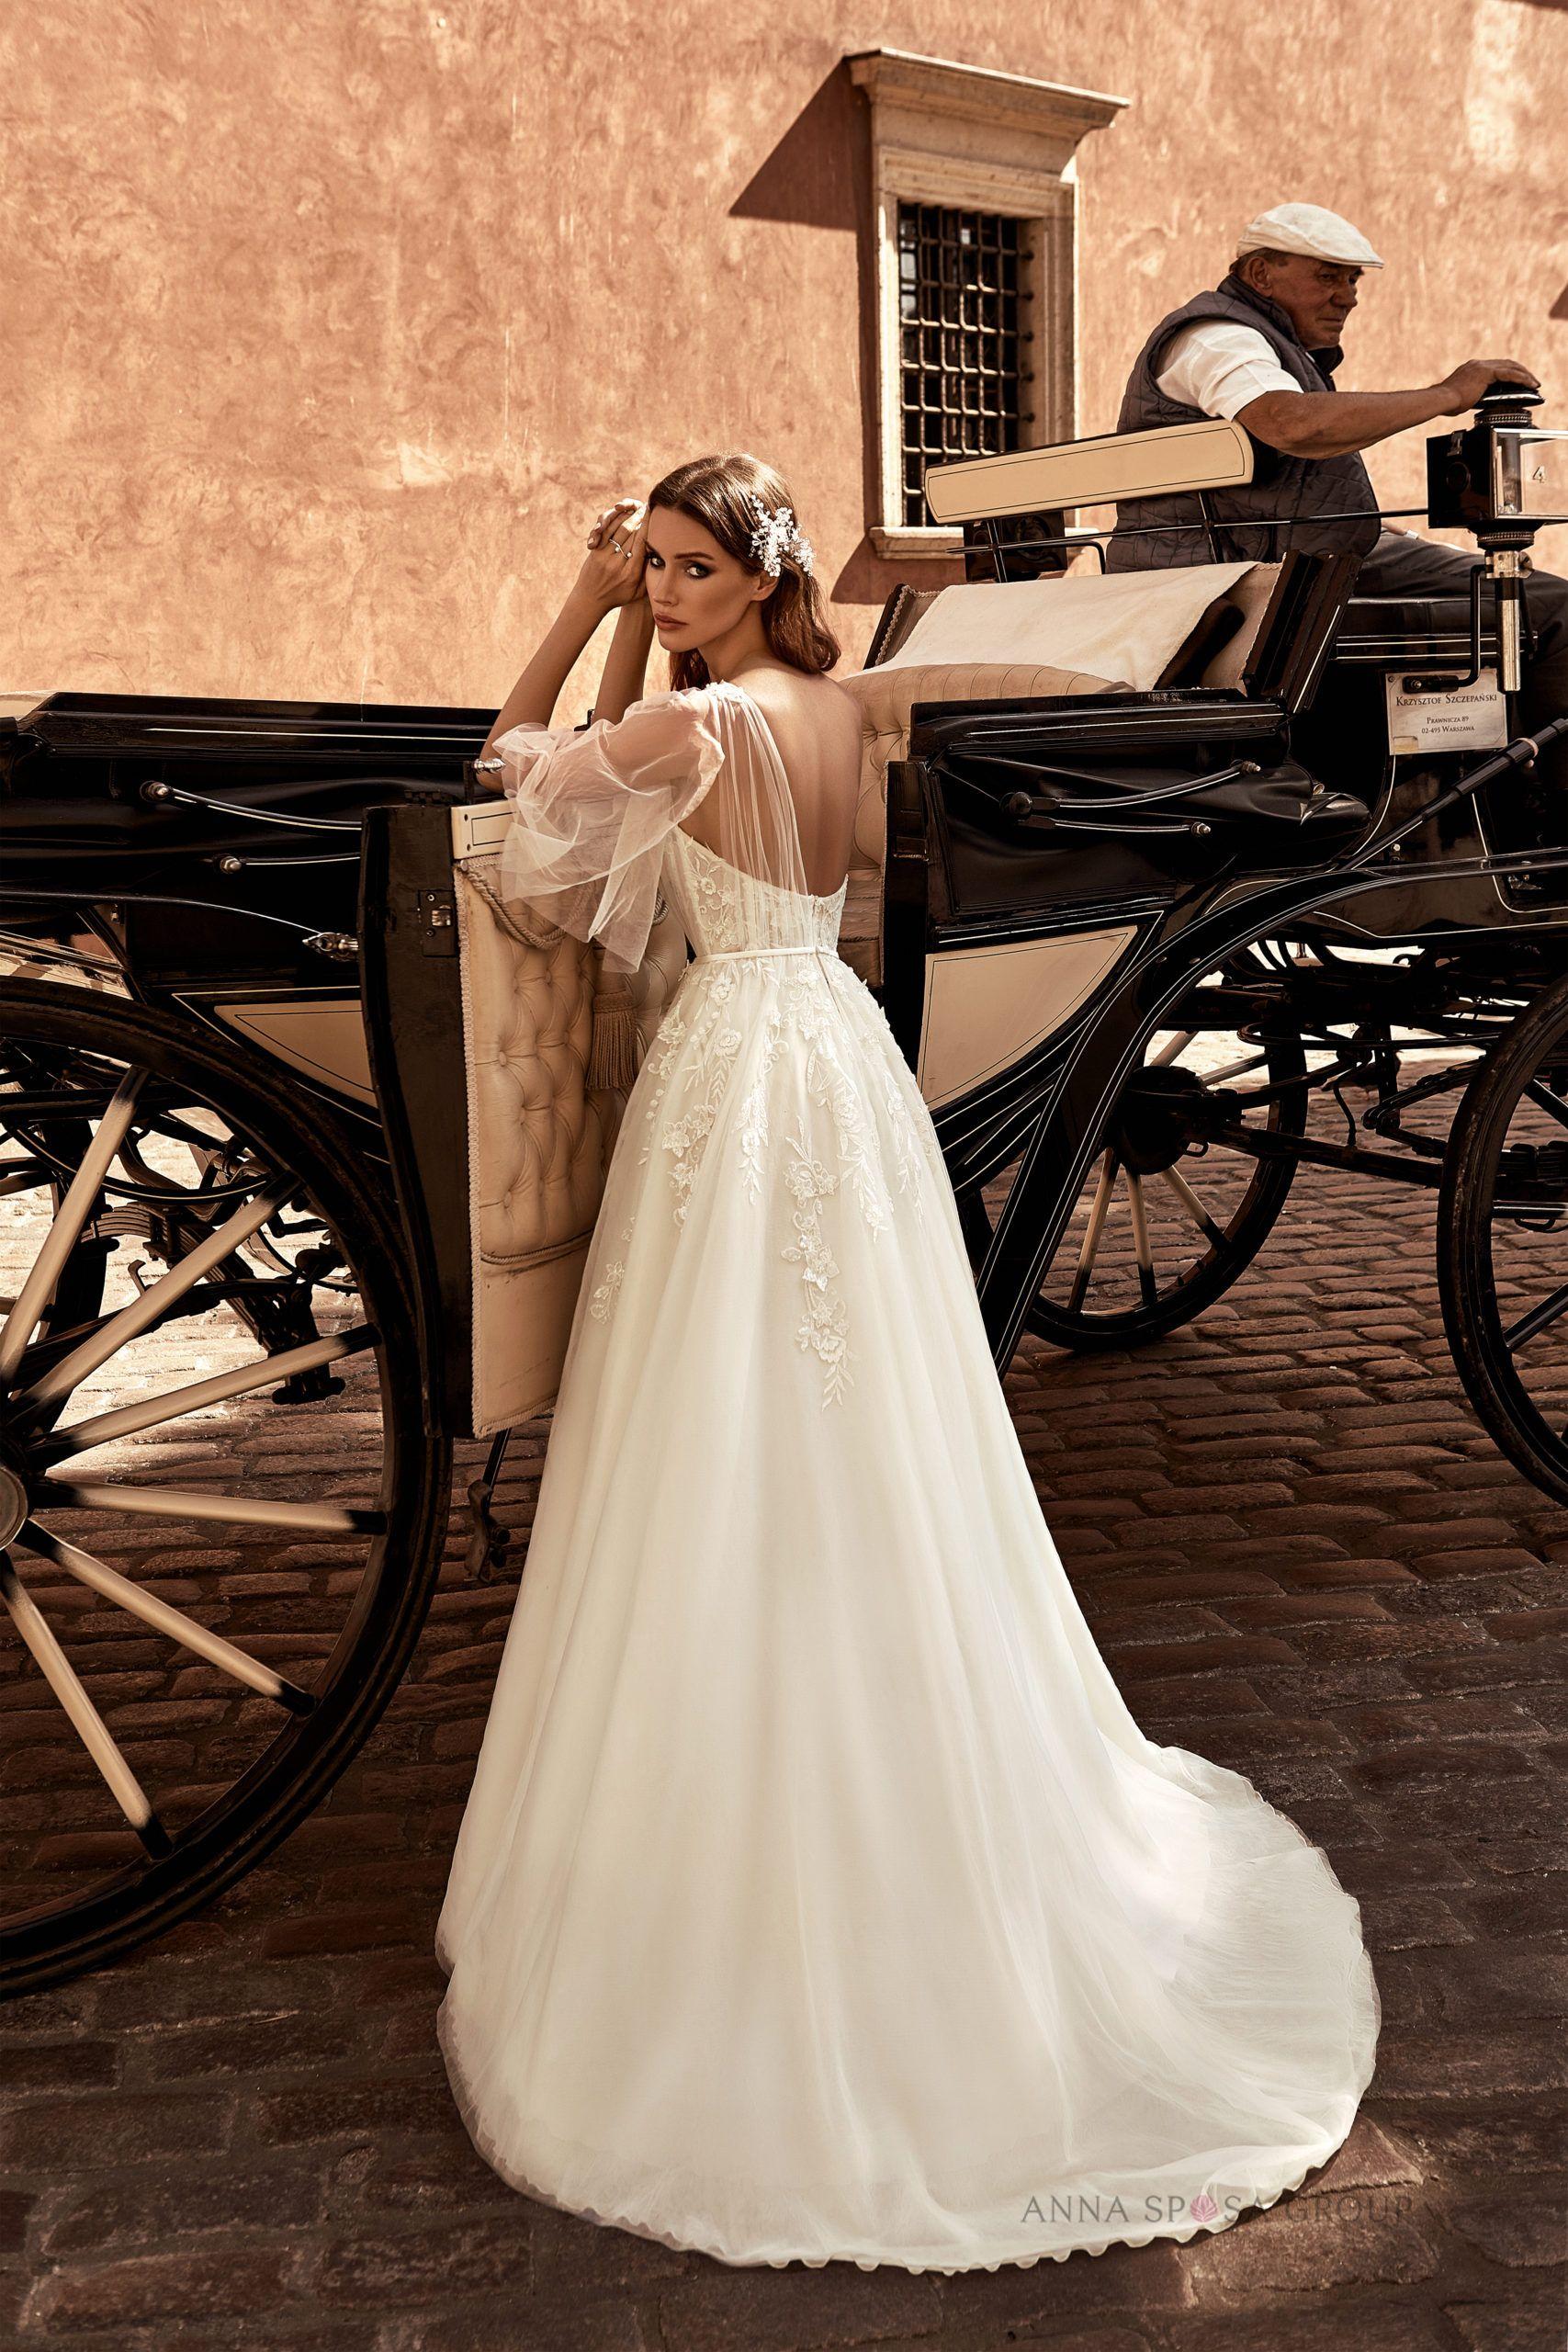 Real Bride San Antonio Tx Patricia Blake Mikaella Bridal Mikaella Bridal Bride Wedding Dresses [ 1113 x 737 Pixel ]